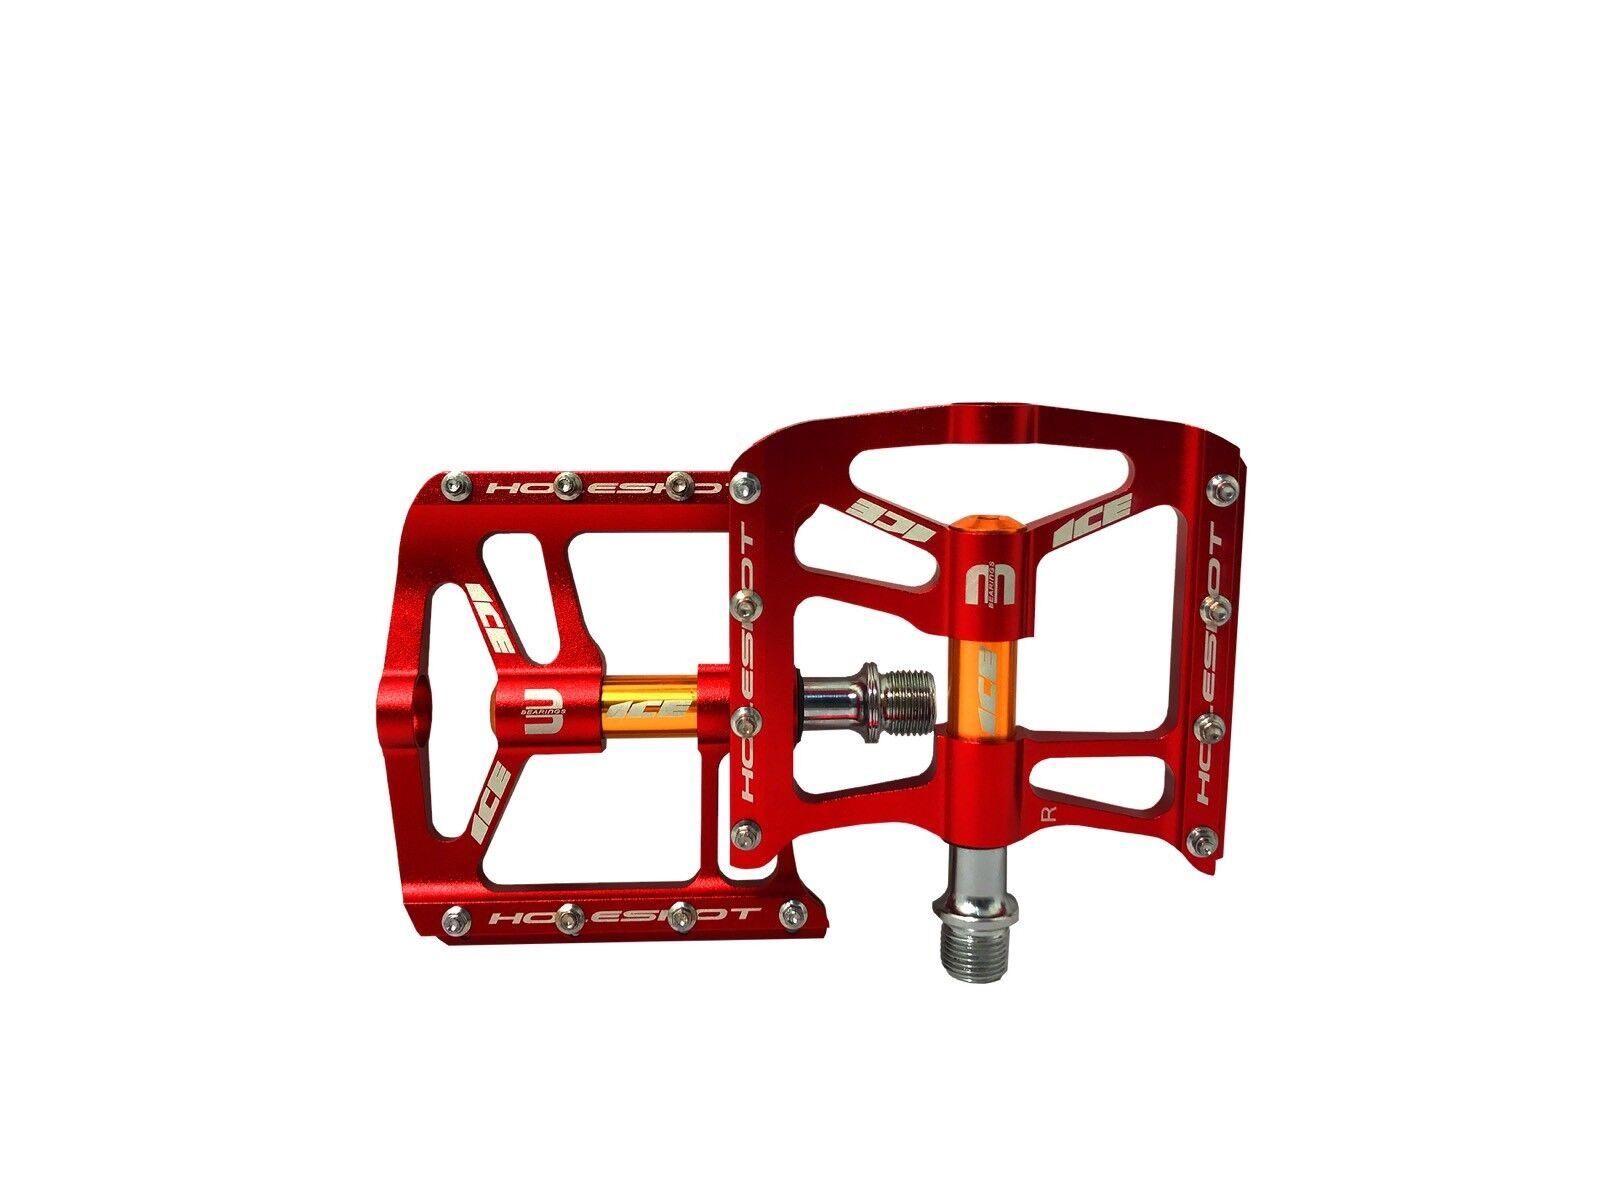 Flat pedals ICE Hole-shot BMX ,MTB PEDALS rot 9 16